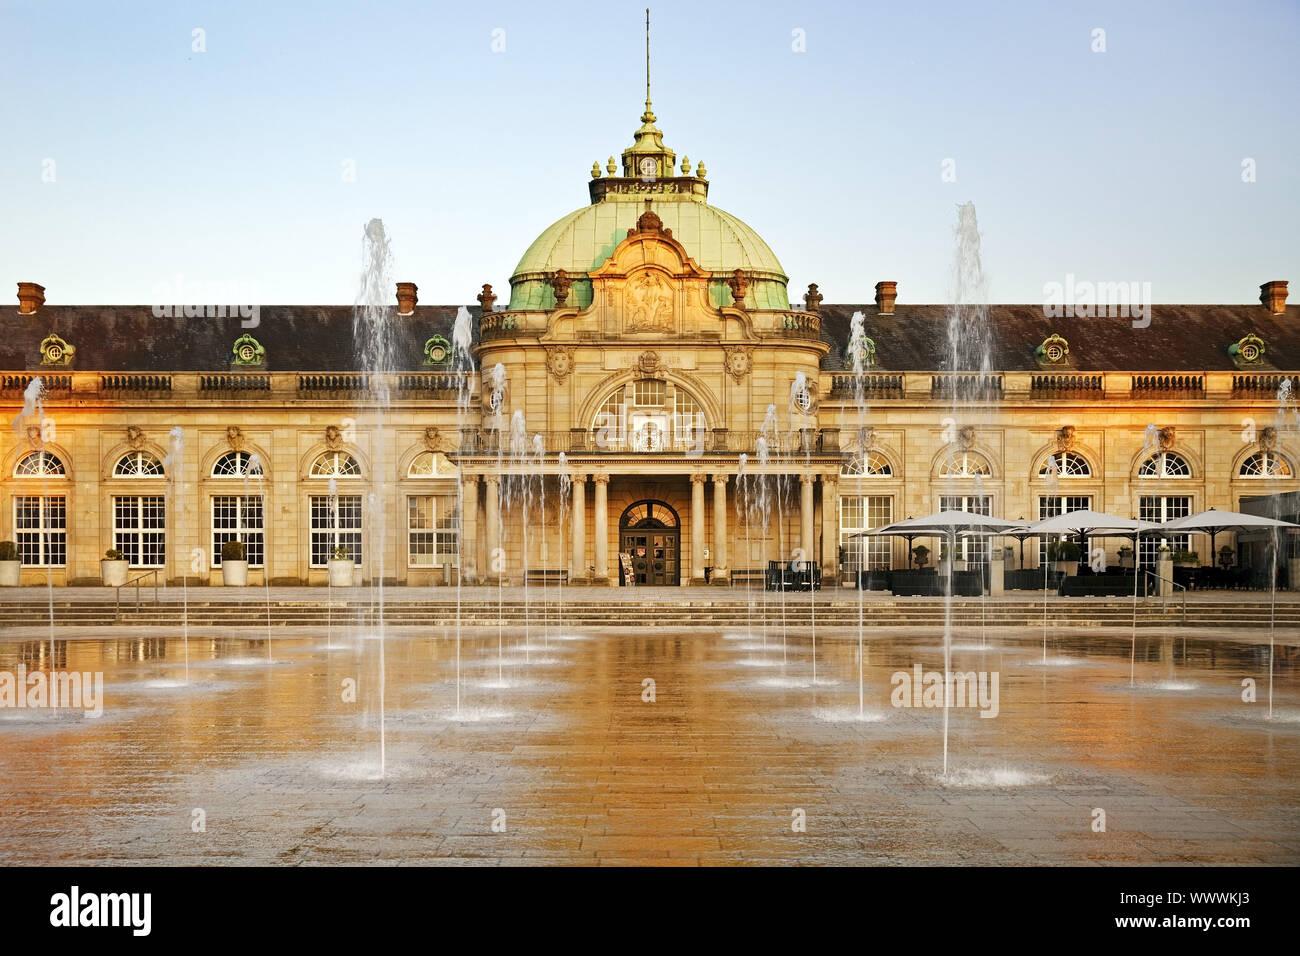 imperial palace, former kurhaus, Bad Oeynhausen, North Rhine-Westphalia, Germany, Europe Stock Photo